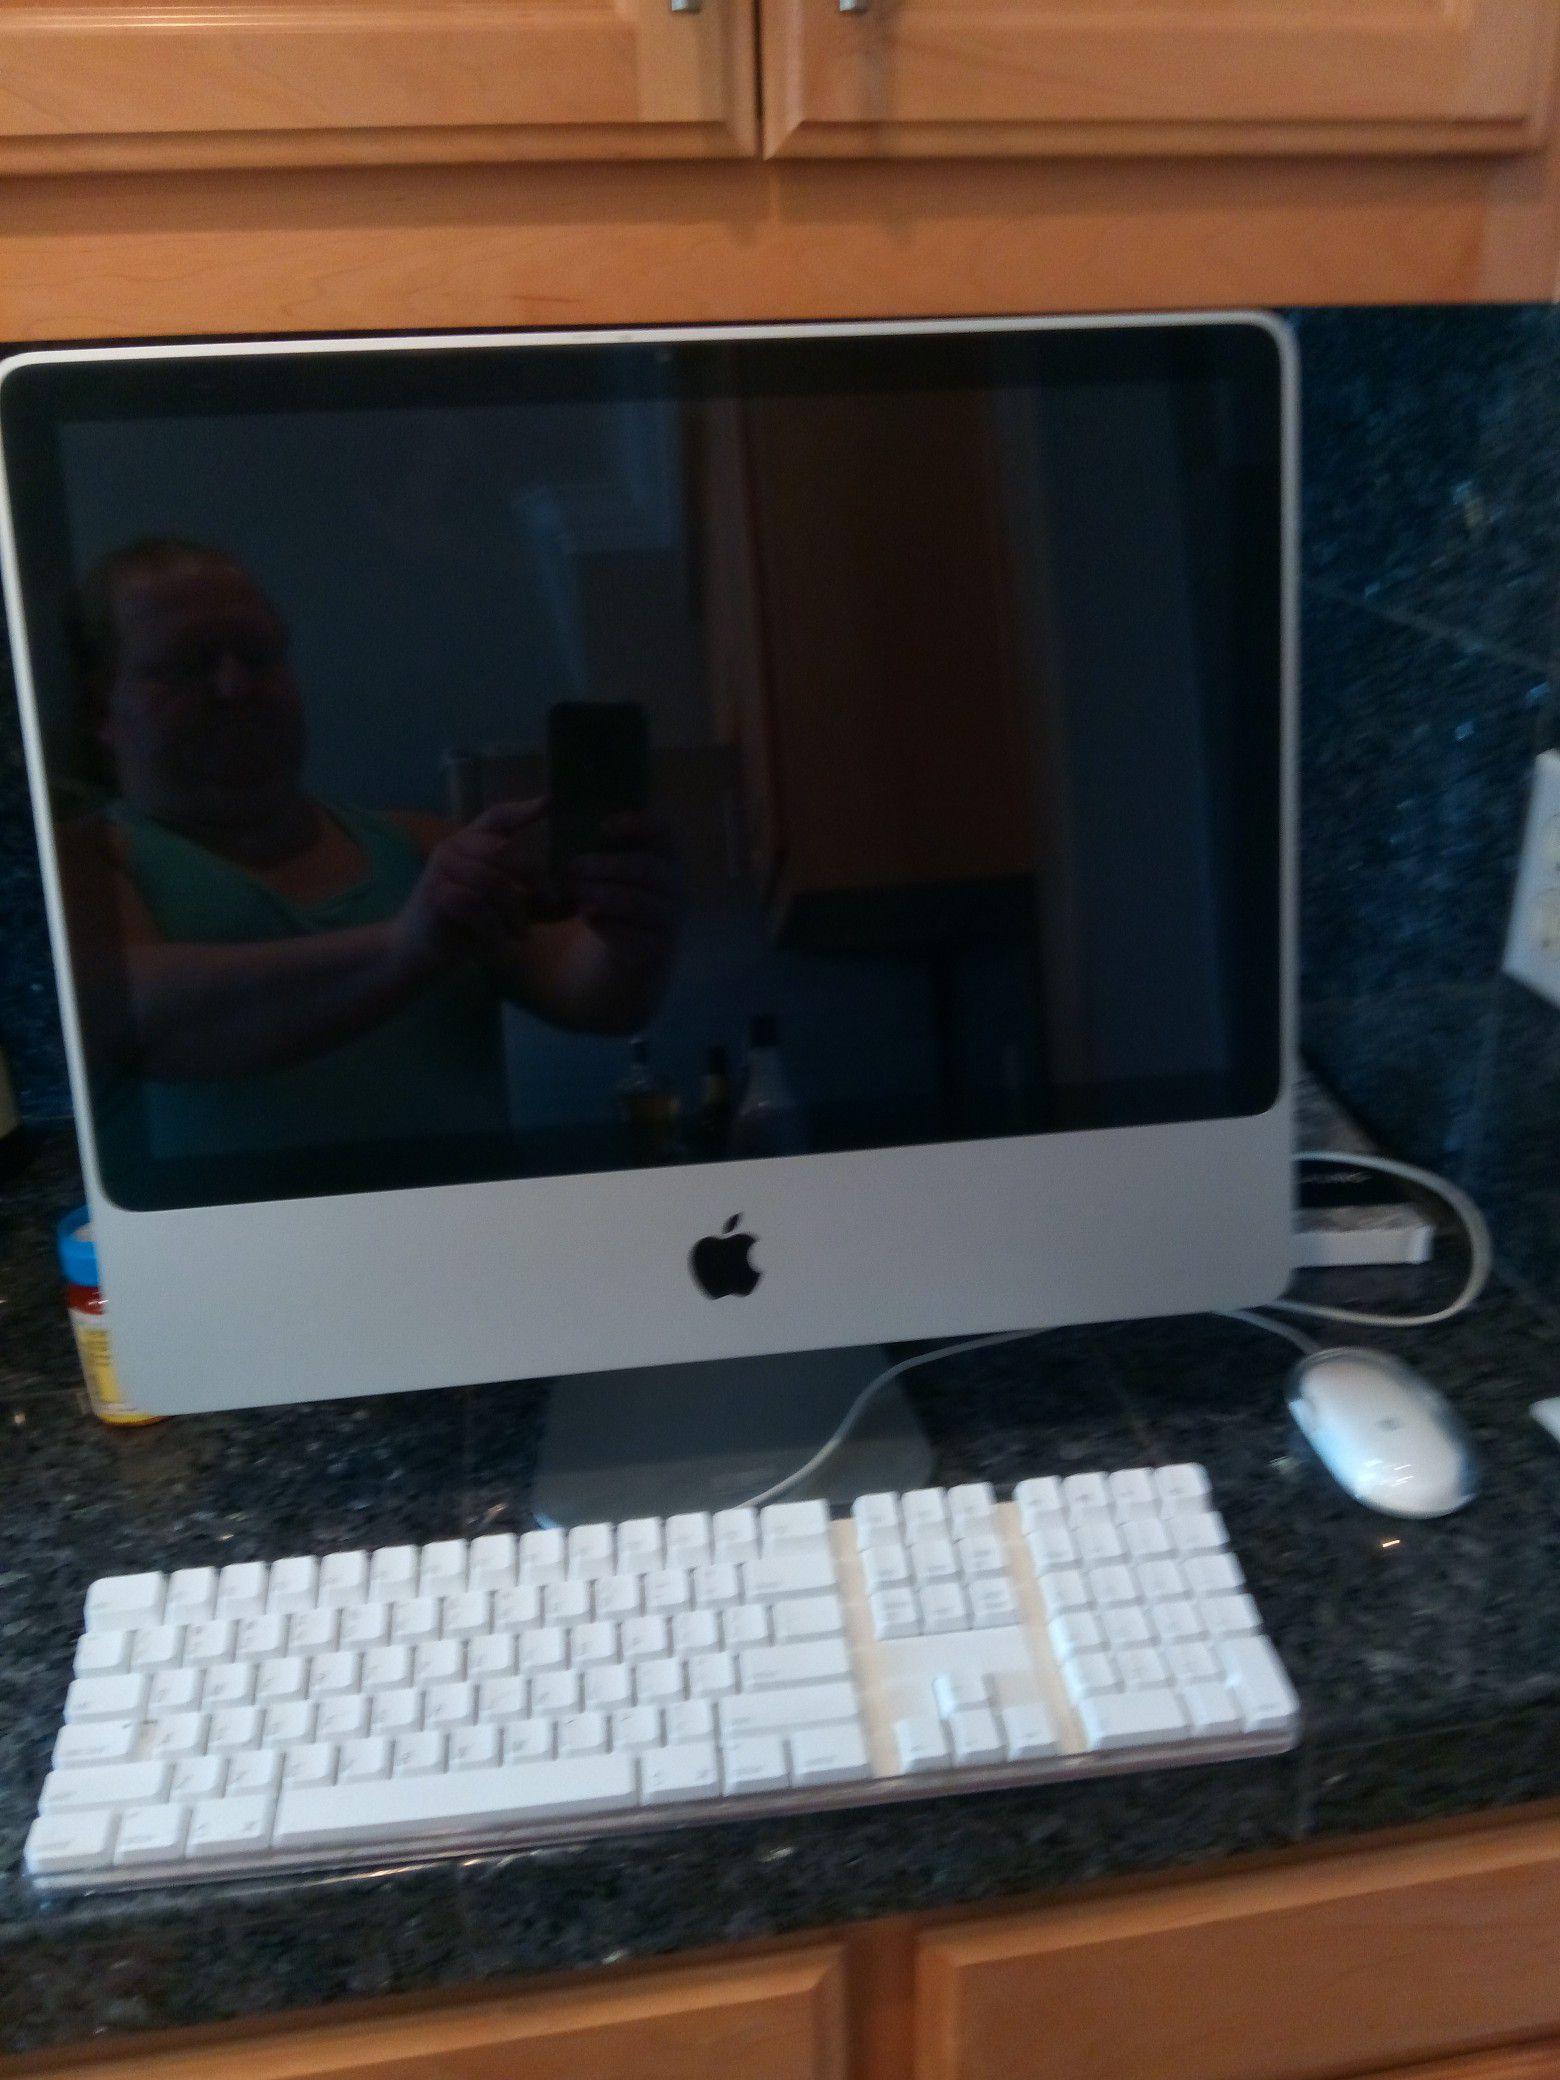 IMac Apple computer 2.26 GHz Intel Core, 4 GB